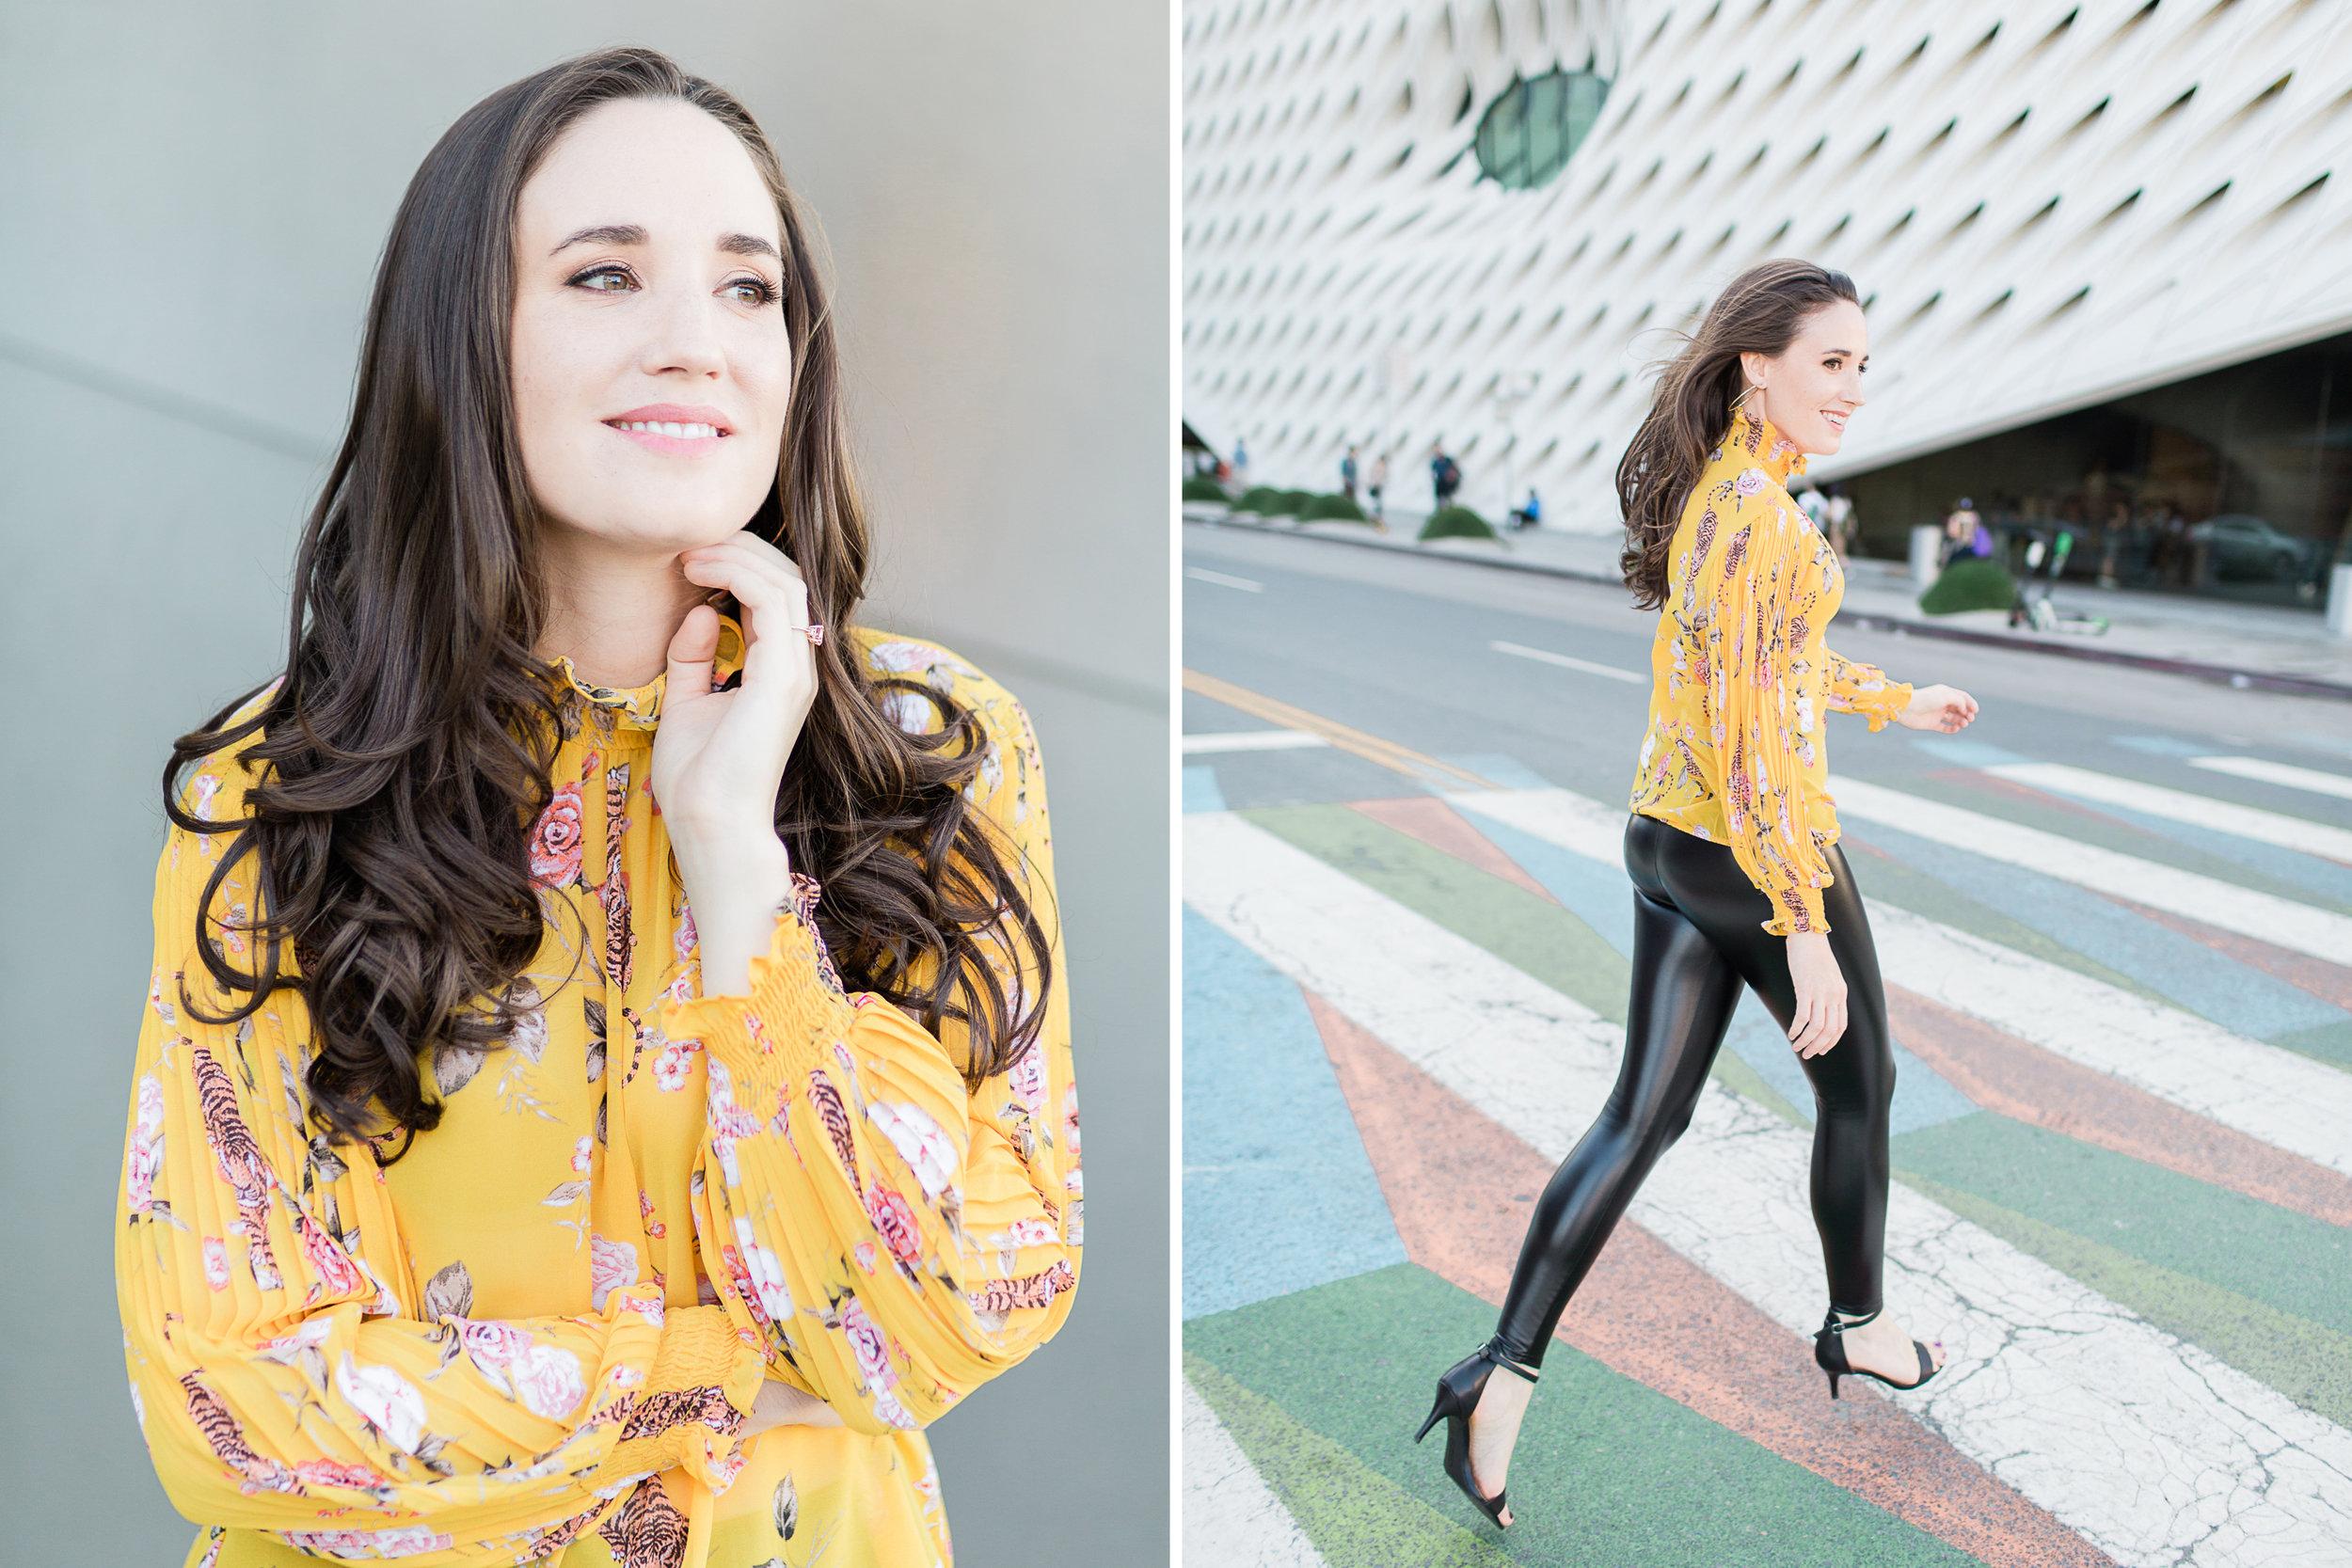 Courtney_Paige_Ray_Los_Angeles_Brand_Photographer_Speaker_Studio_Helena_Bowen.jpg